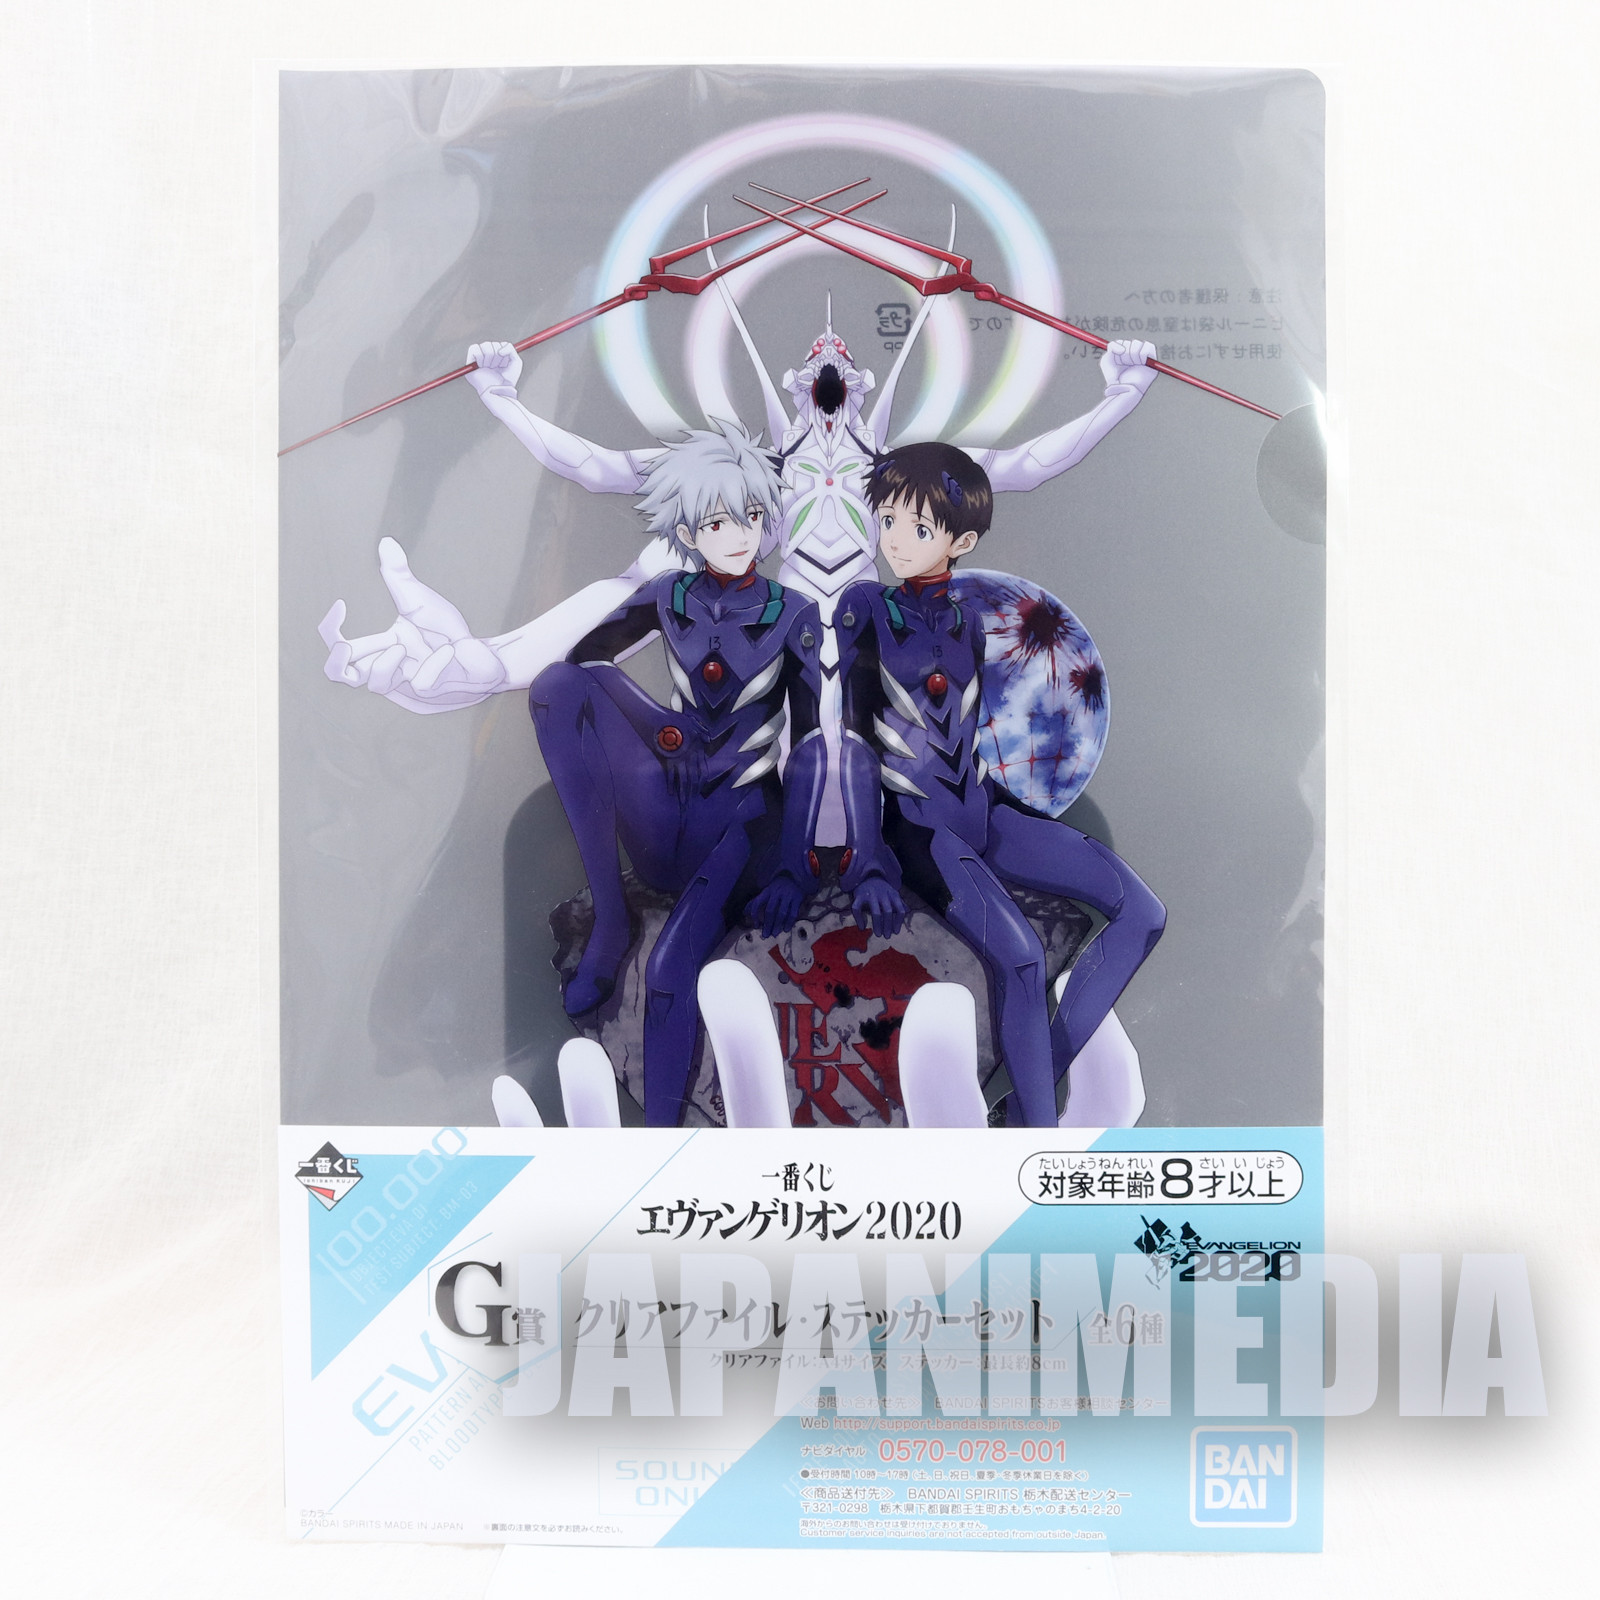 Evangelion Shinji Ikari & Kaworu Nagisa File Holder w/Sticker BANDAI JAPAN ANIME